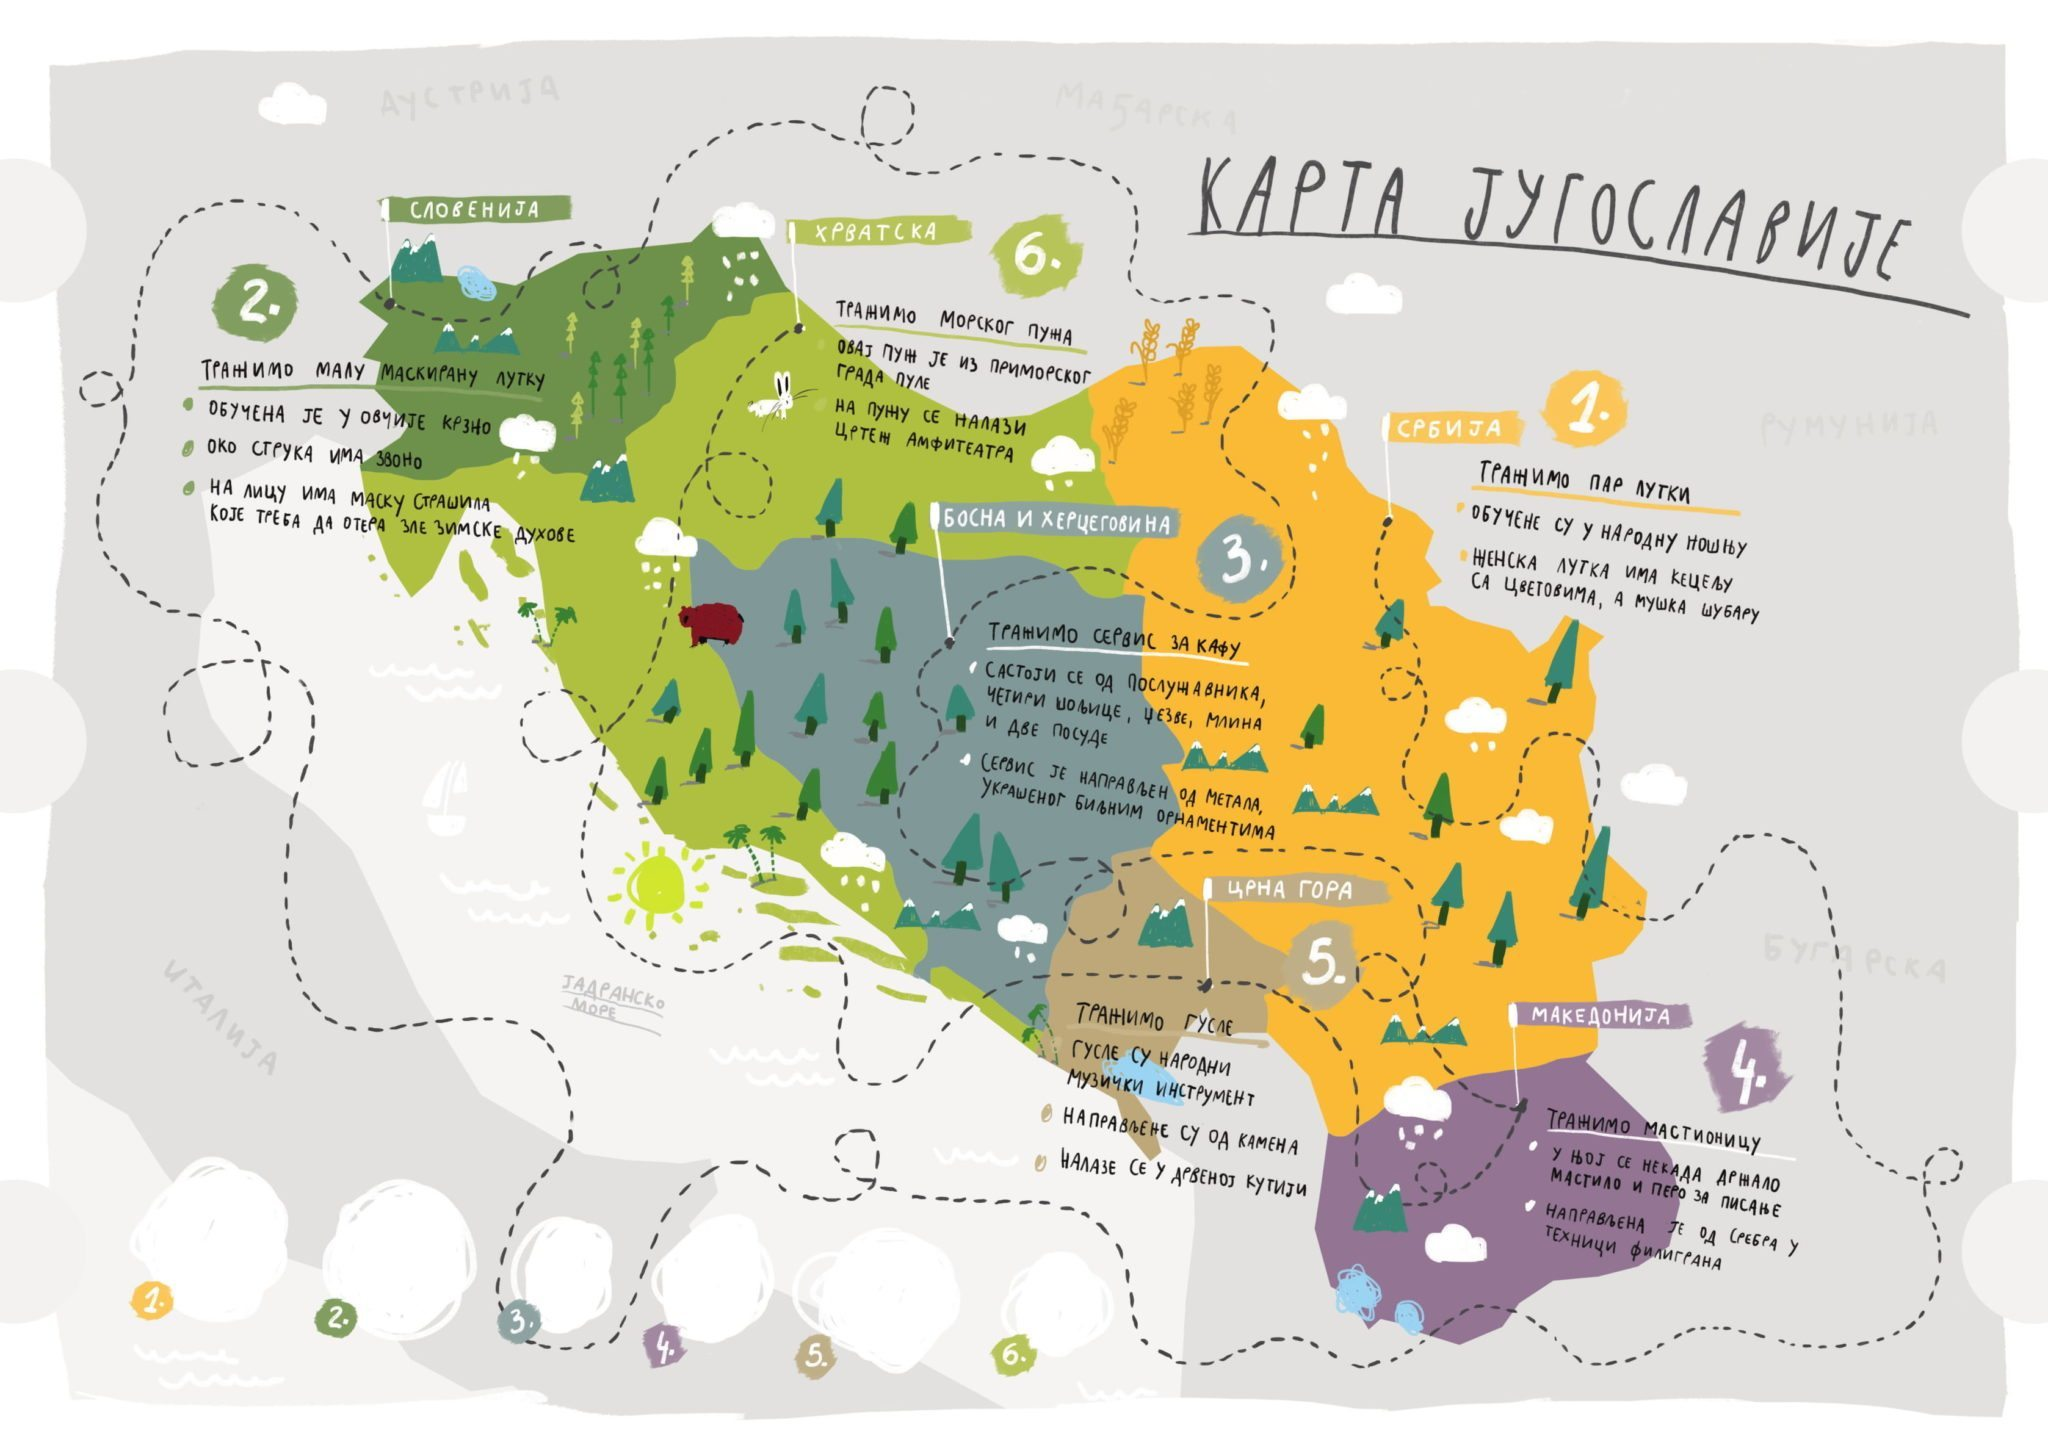 mapa jugoslavije Muzej Jugoslavije mapa jugoslavije